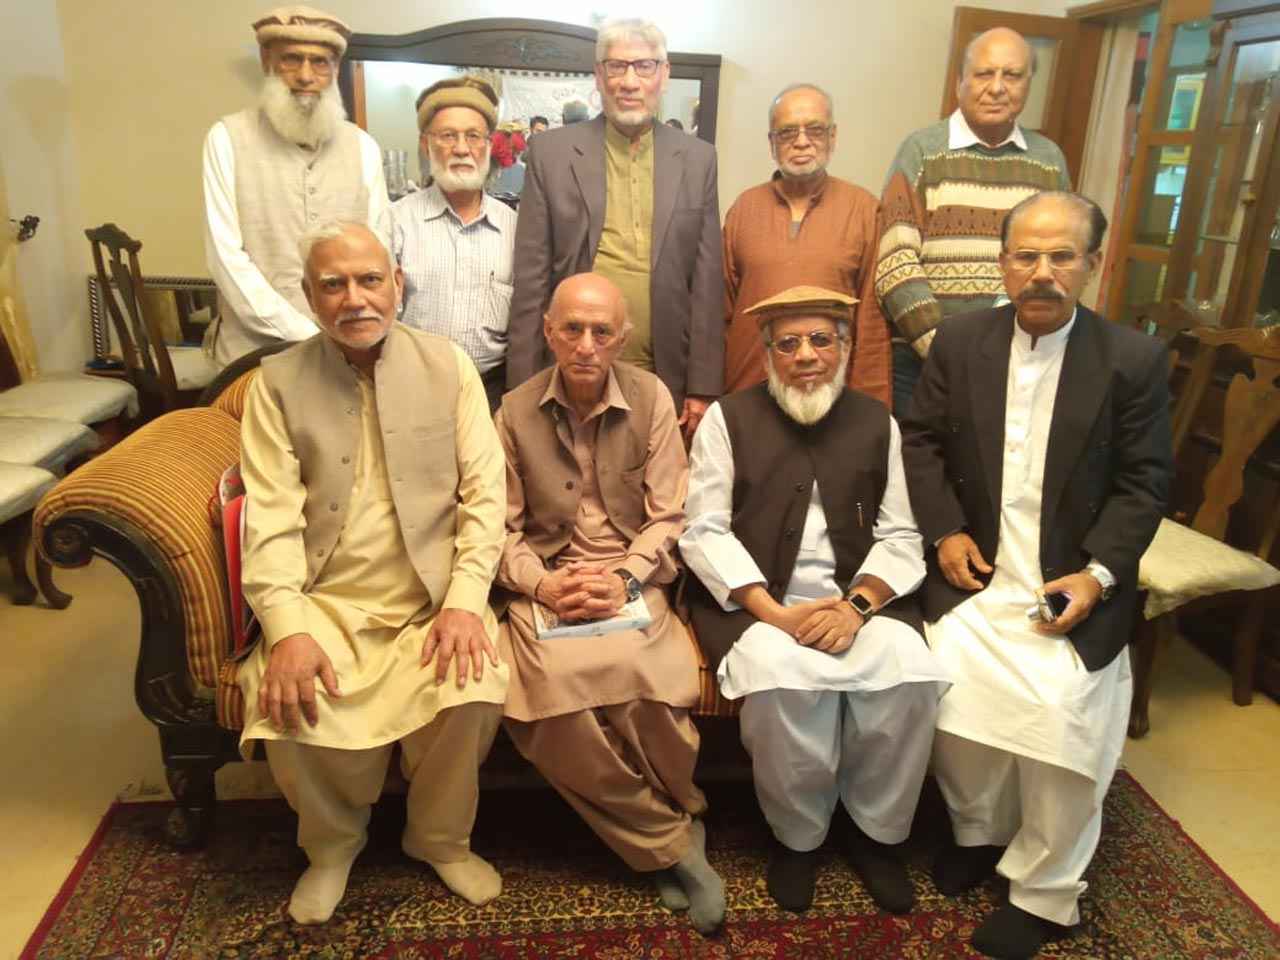 Sitting: Shabbar Hassan Abidi, Kosar Naqvi, Engr. Iqbal A. Khan, Shafiq A. Khan - Standing: Saleemullah Hussain, Engr. SW Fakhri, Muhammad Salim Hamid, MA Matin, Farooq Khan